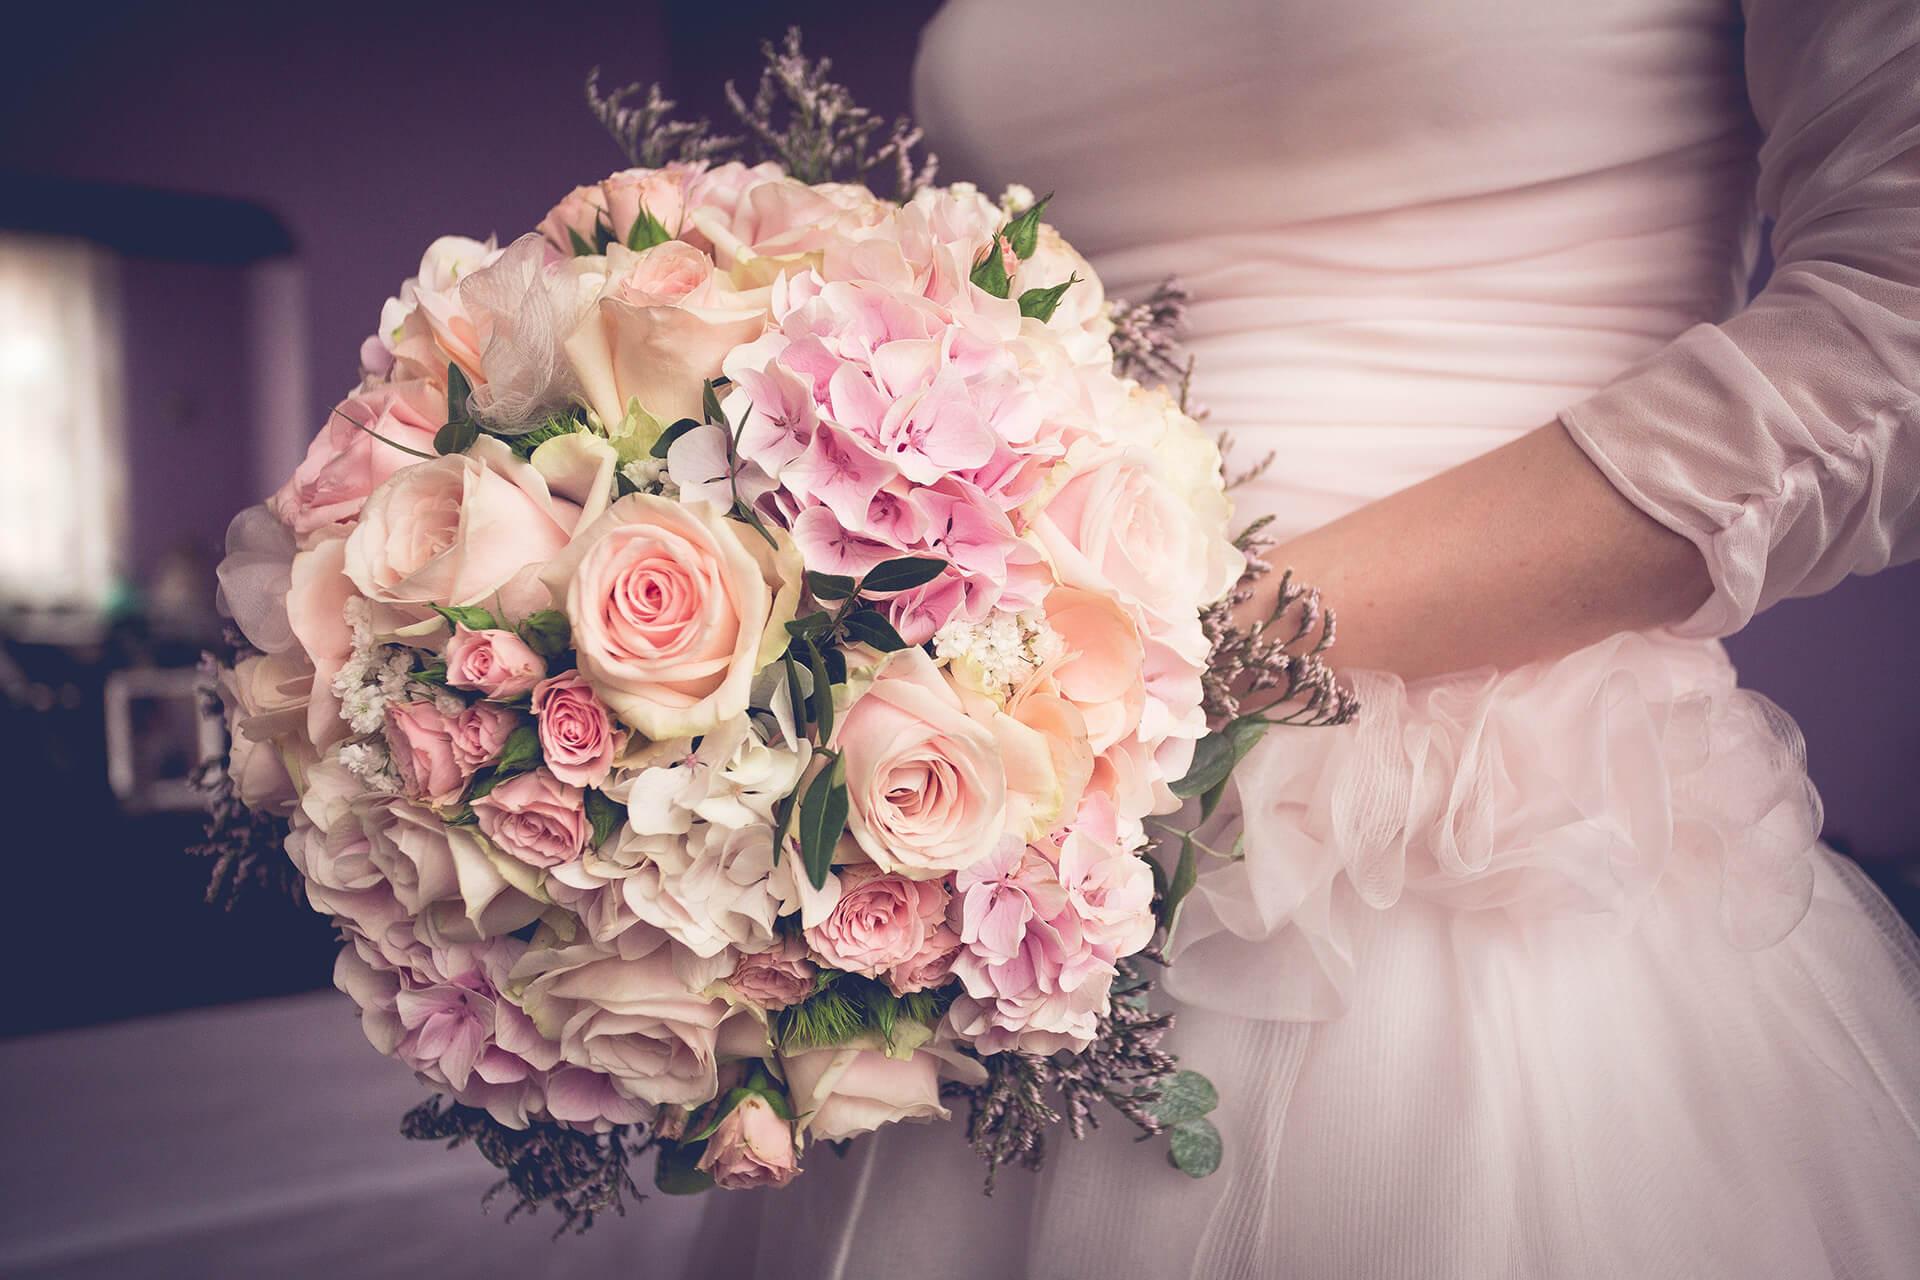 bouquet sposa matrimonio rose alain battiloro fotografo